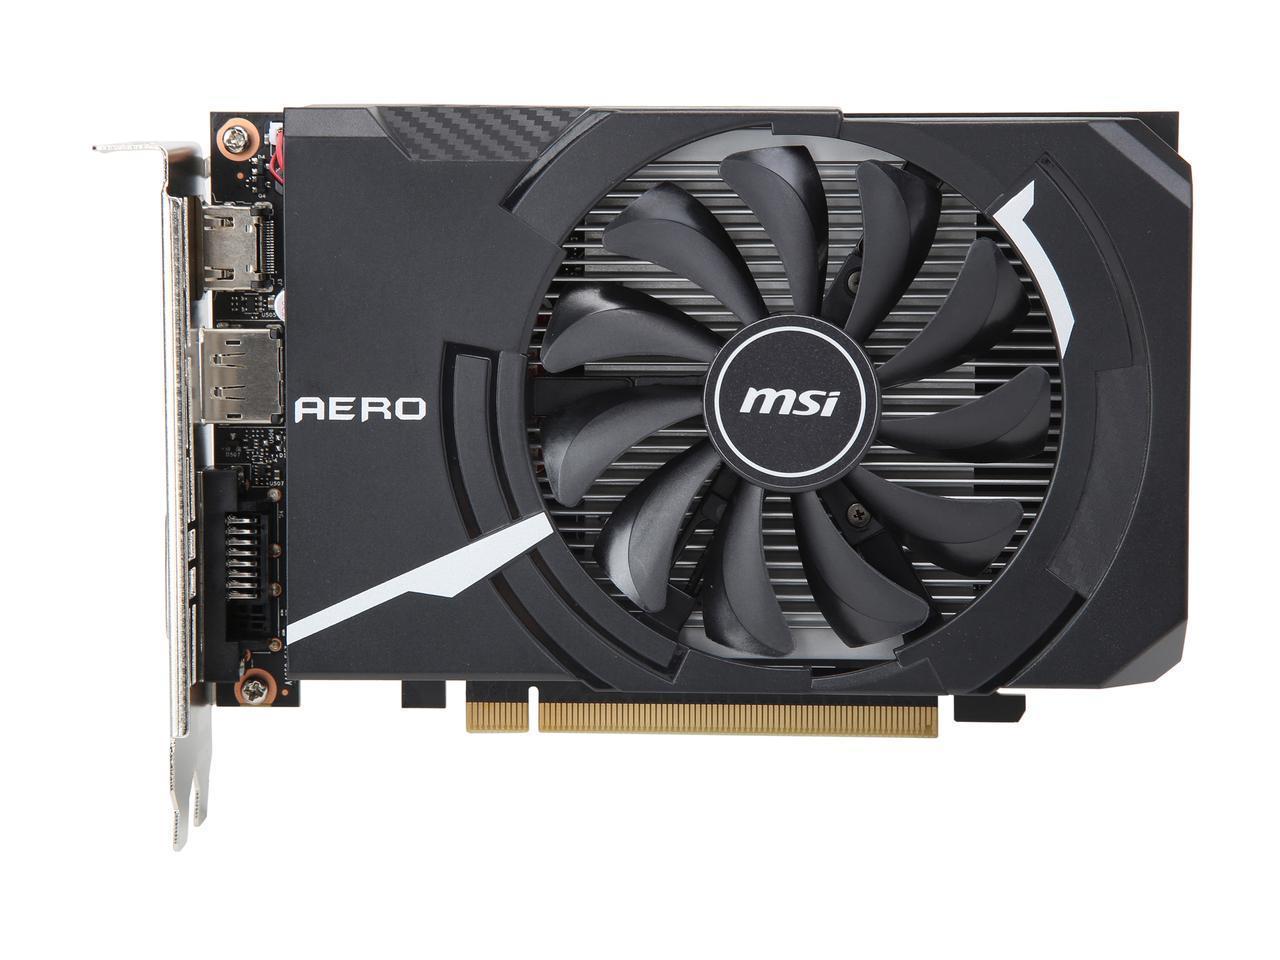 MSI GeForce GTX 1650 DirectX 12 GTX 1650 AERO ITX 4G OC 4GB 128-Bit GDDR5 PCI Express 3.0 x16 HDCP Ready Video Card $129.99 AR & AC